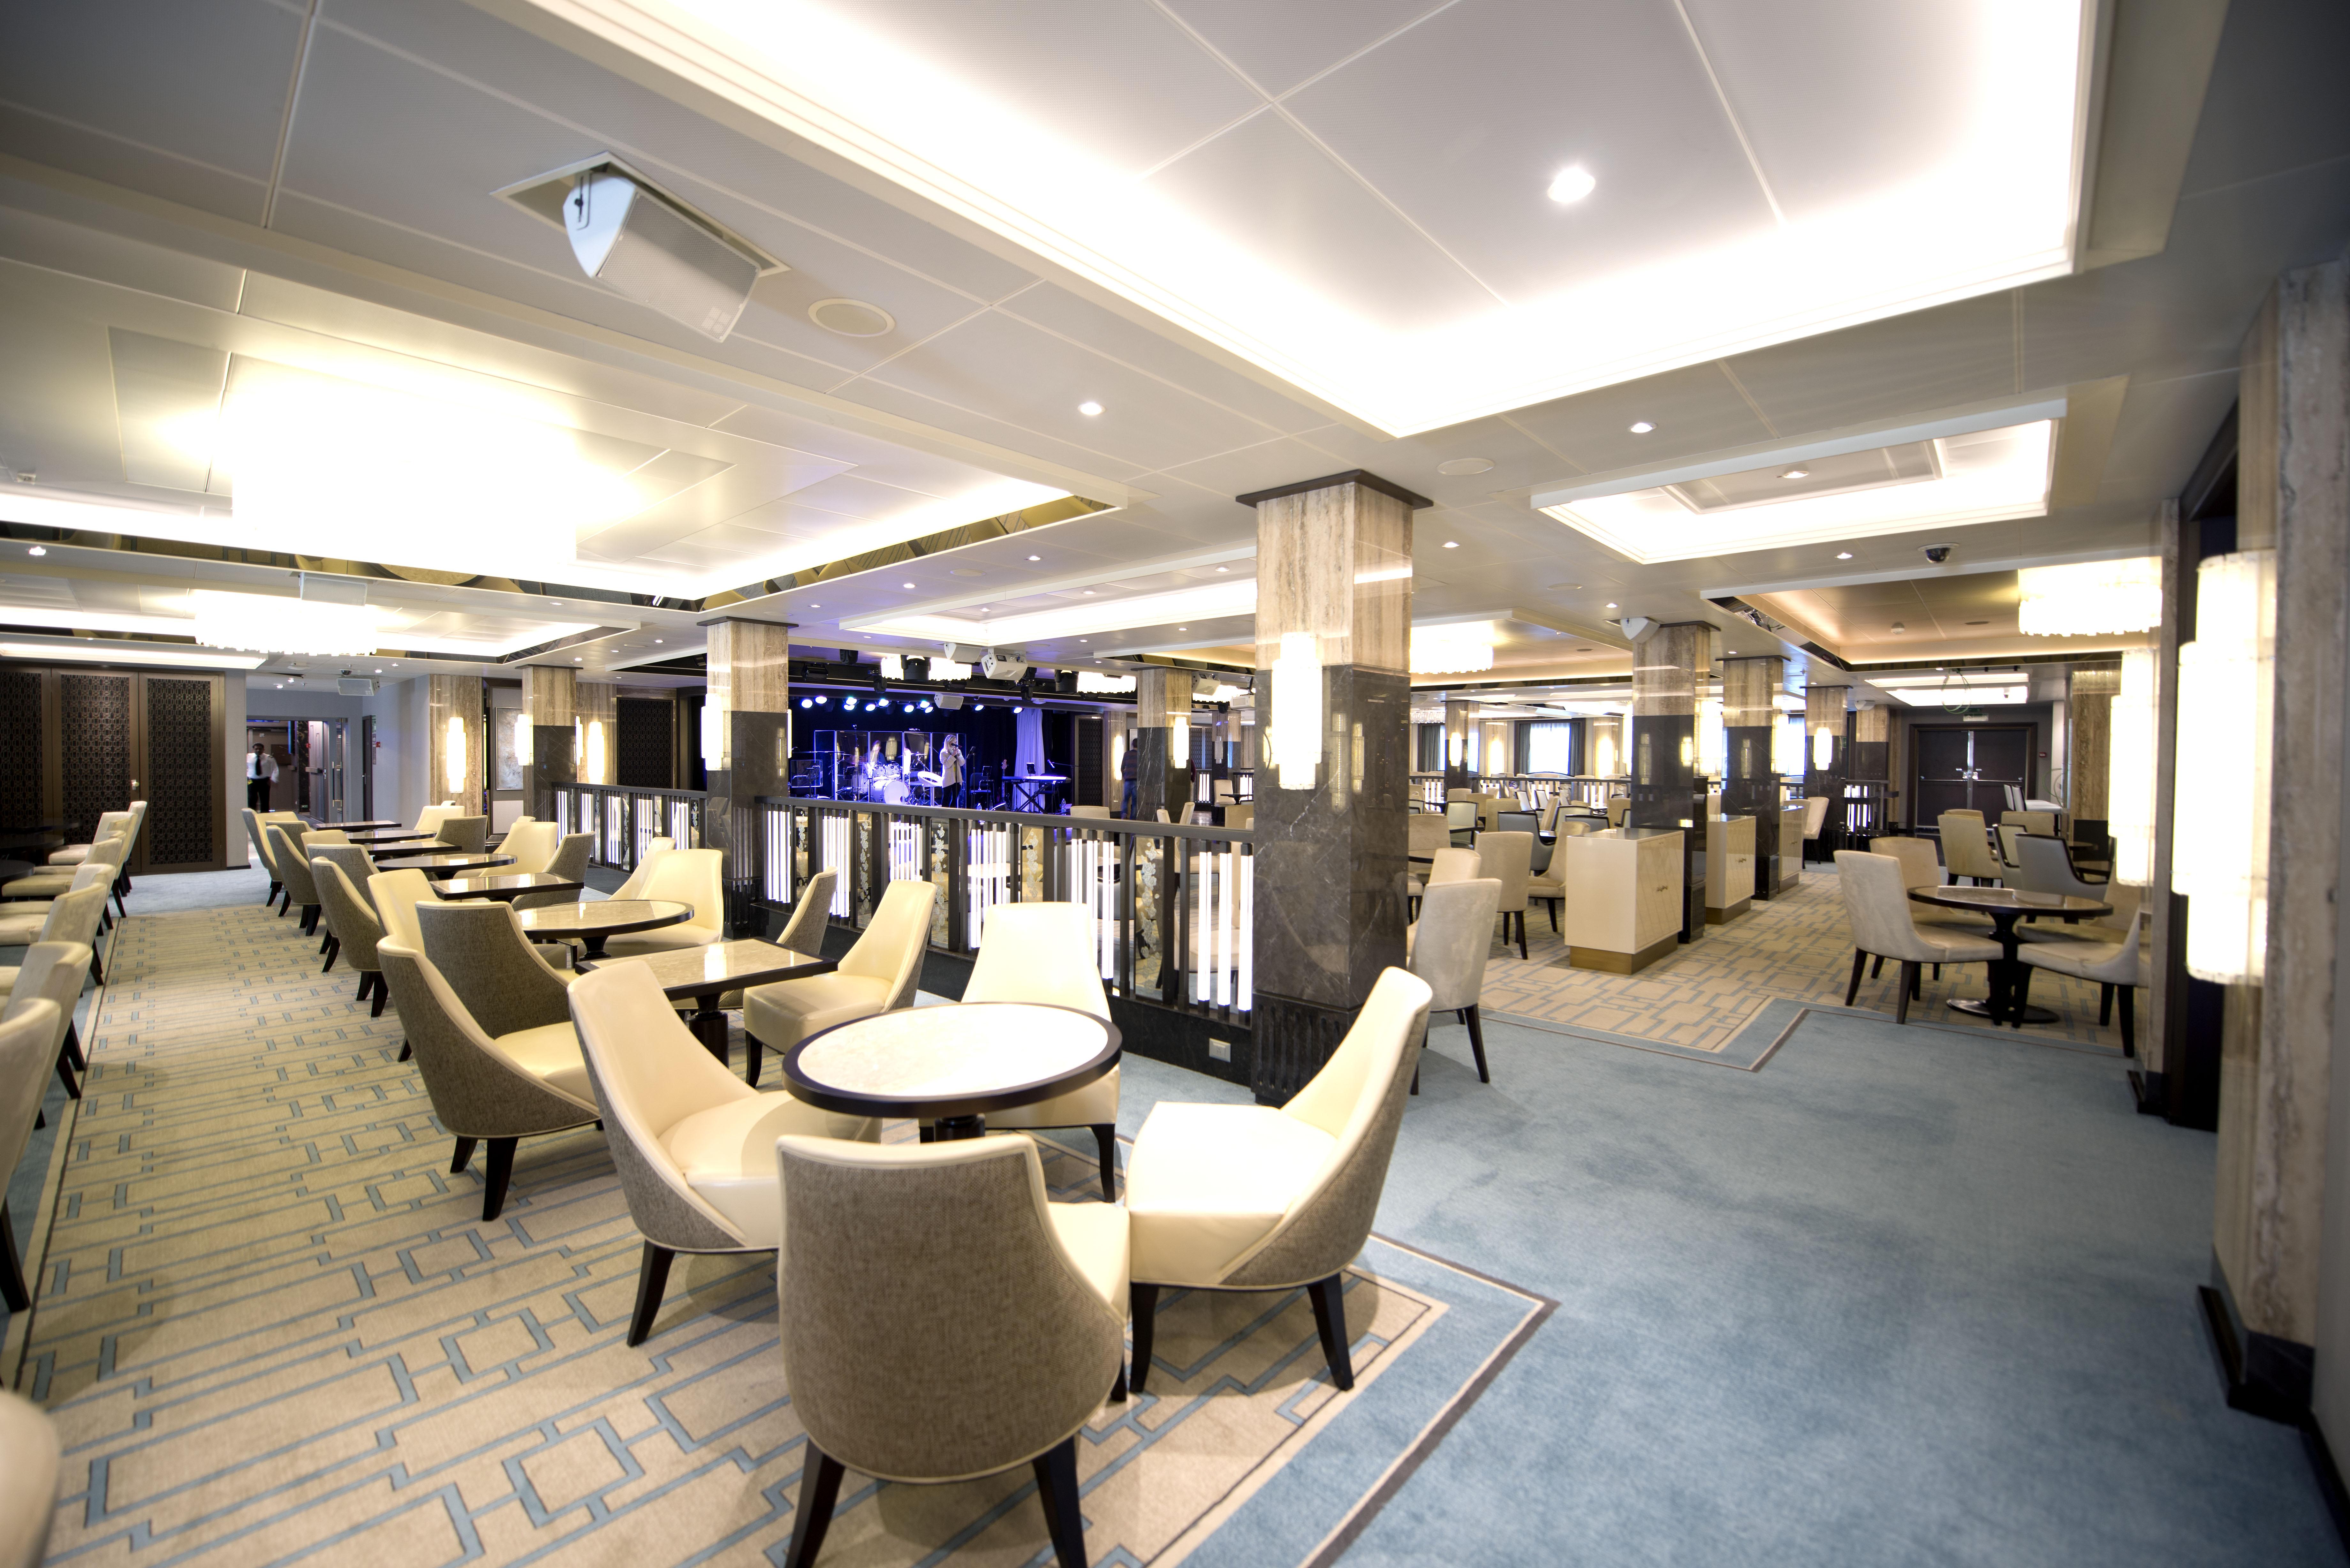 P&O Cruises Britannia Interior Crystal Room D806820 [Tif 14714596602].jpg